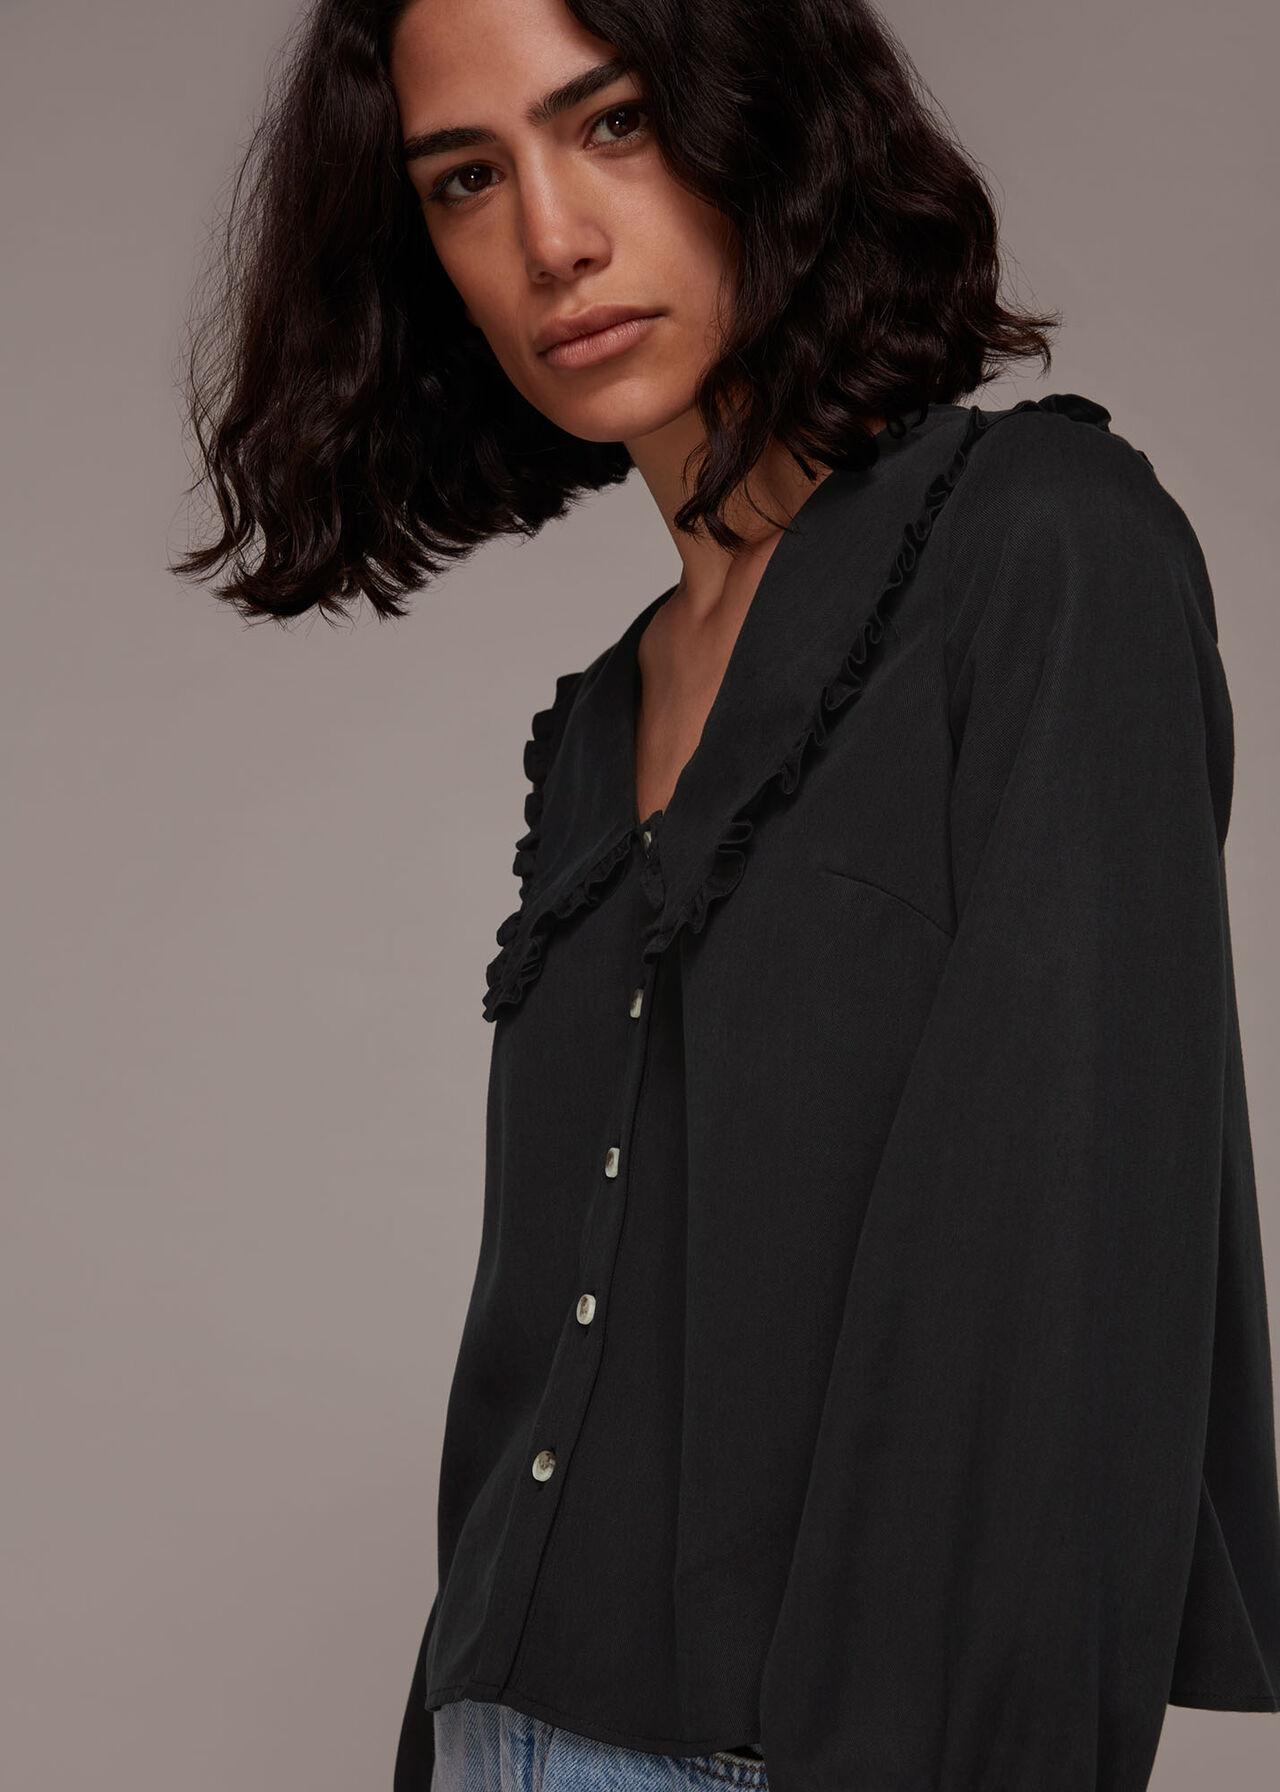 Oversized Collar Detail Top